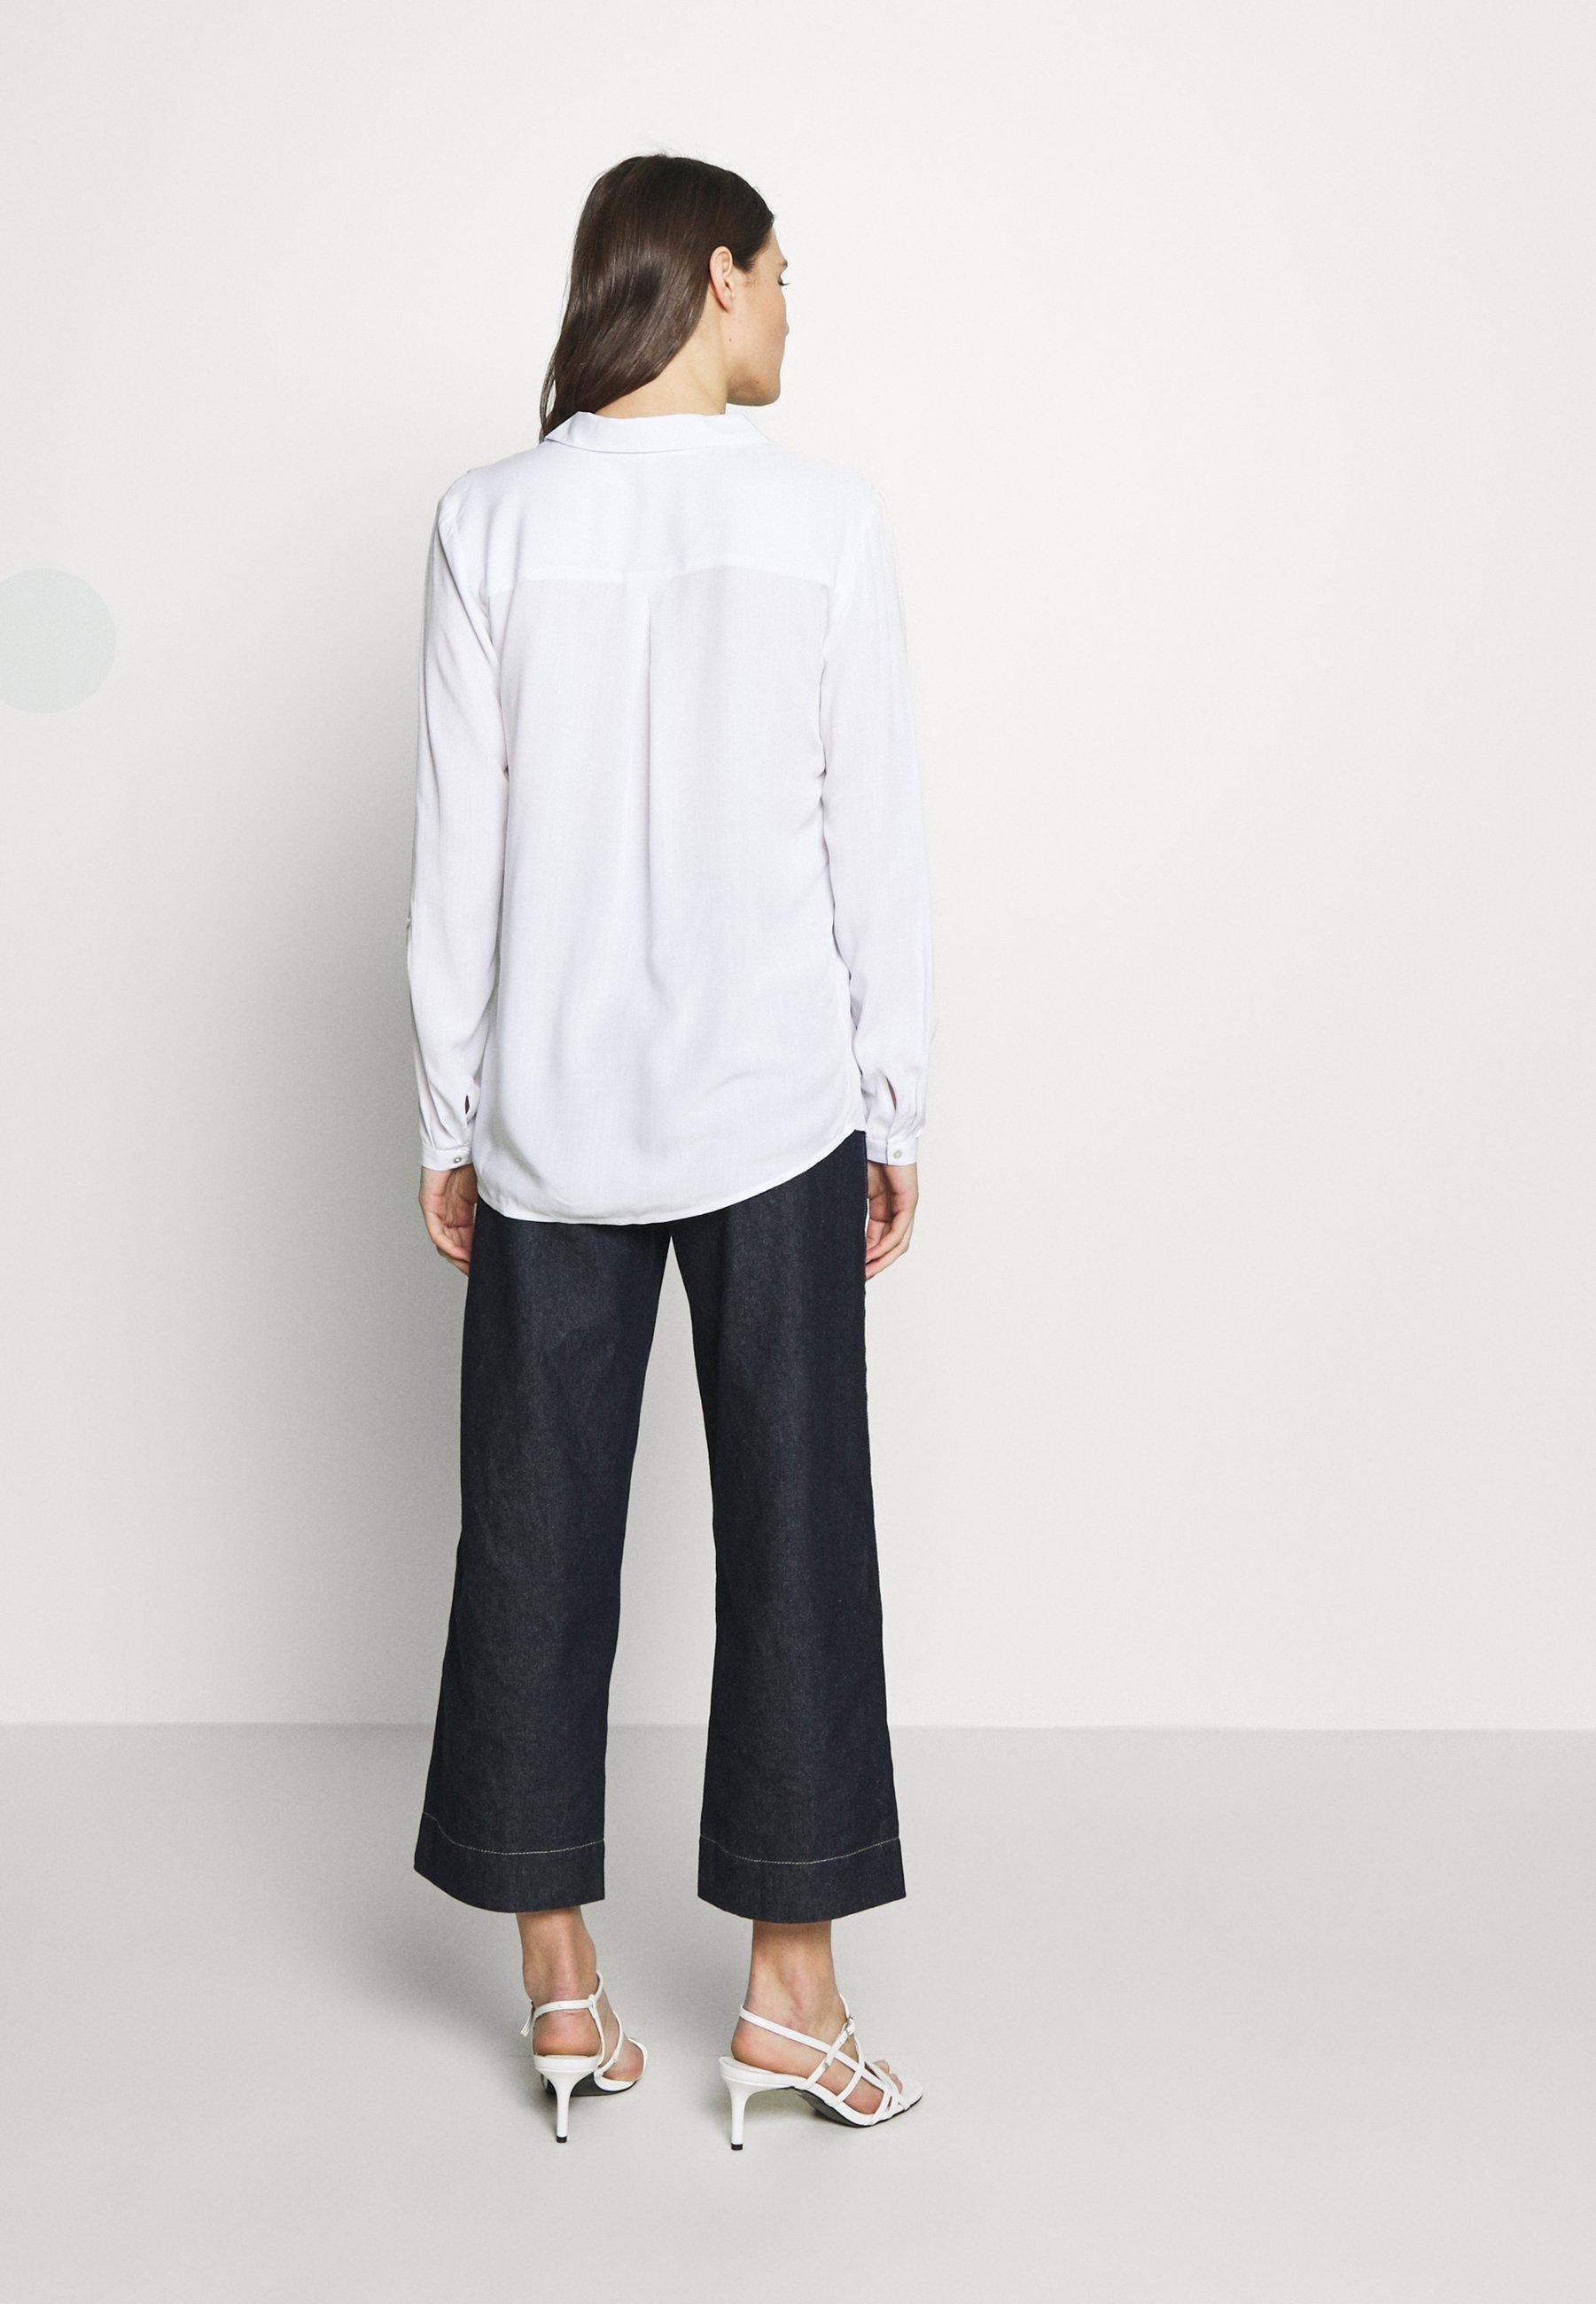 Esprit NEW SLUB - Blouse - white - Dameskleding Klassiek